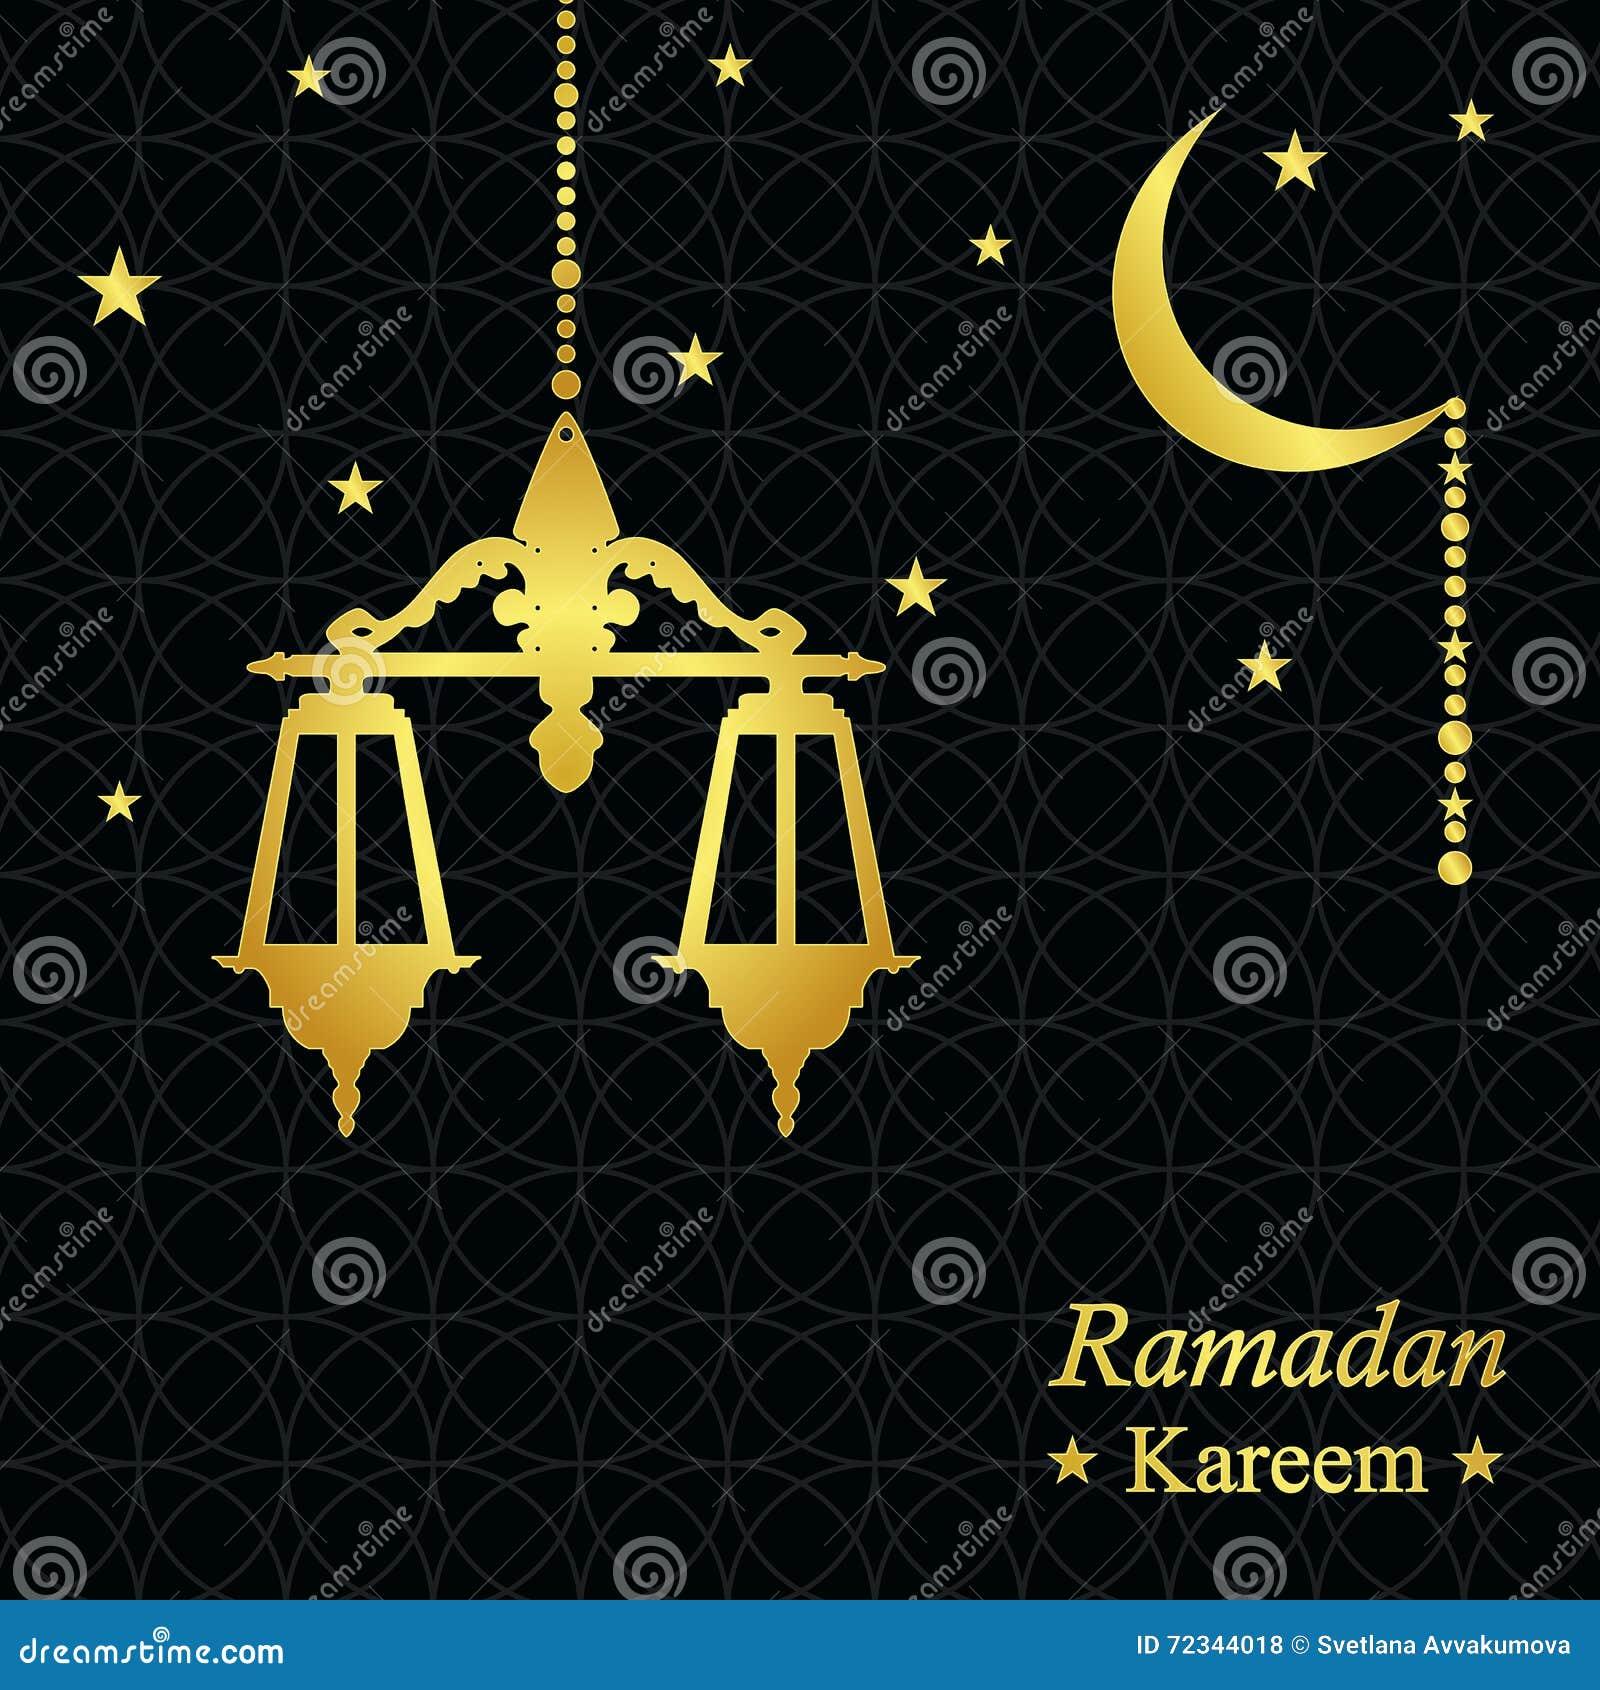 Gold And Black Greeting Card Ramadan Kareem Stock Vector